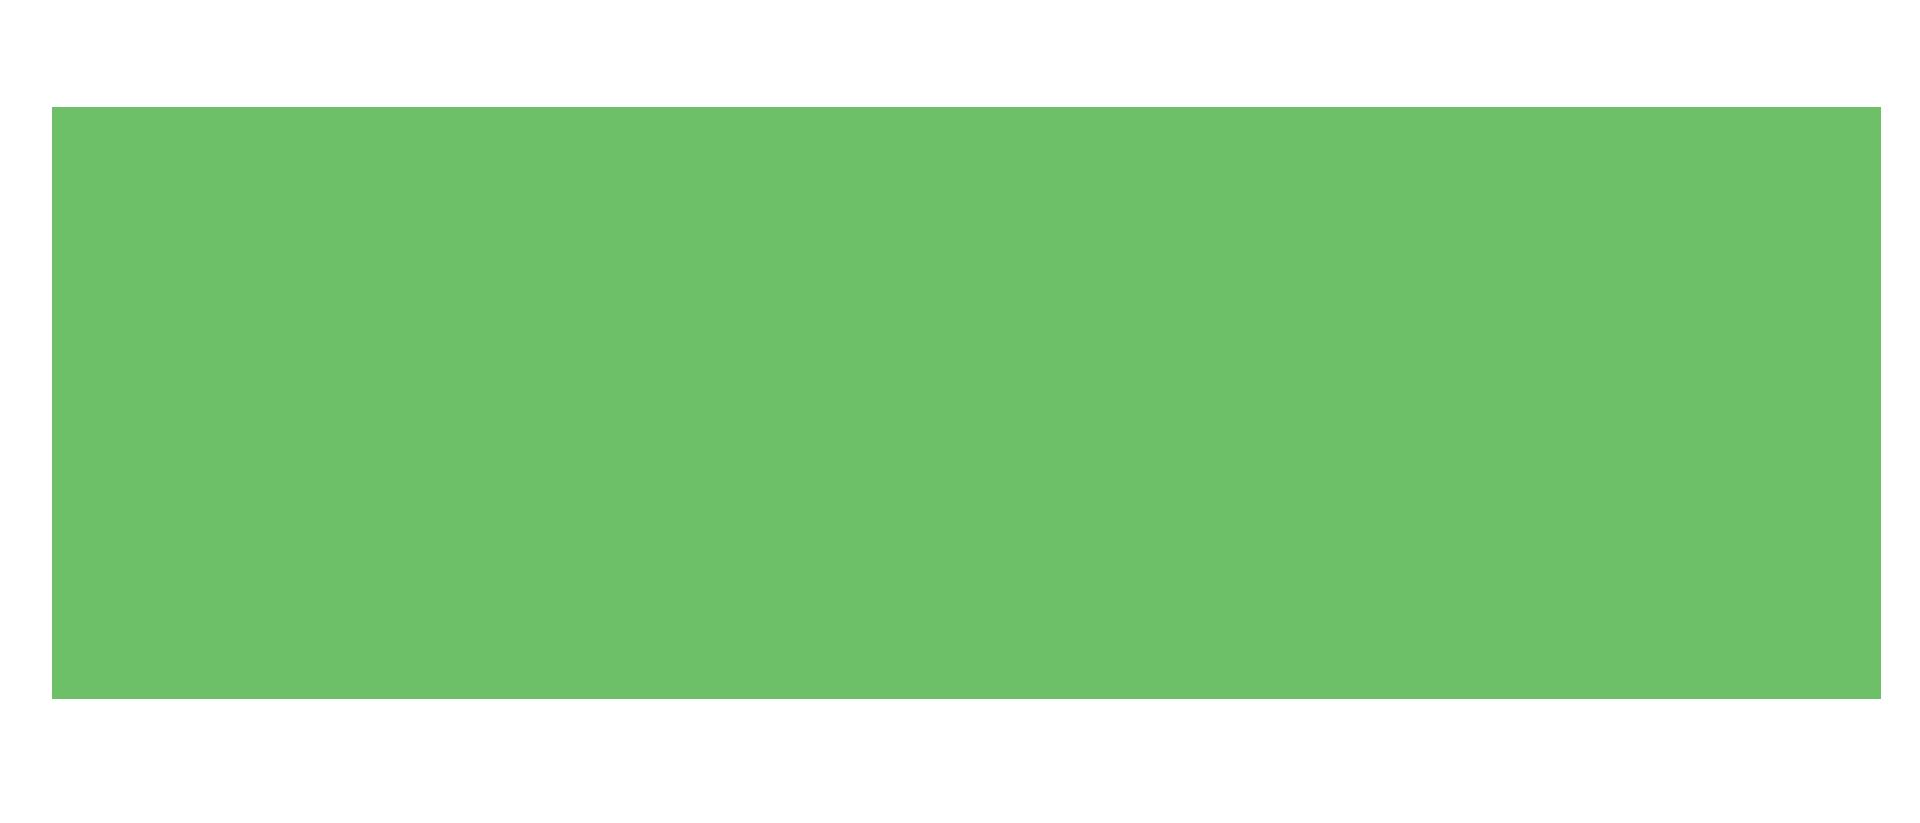 Sael-bg1-02a.png